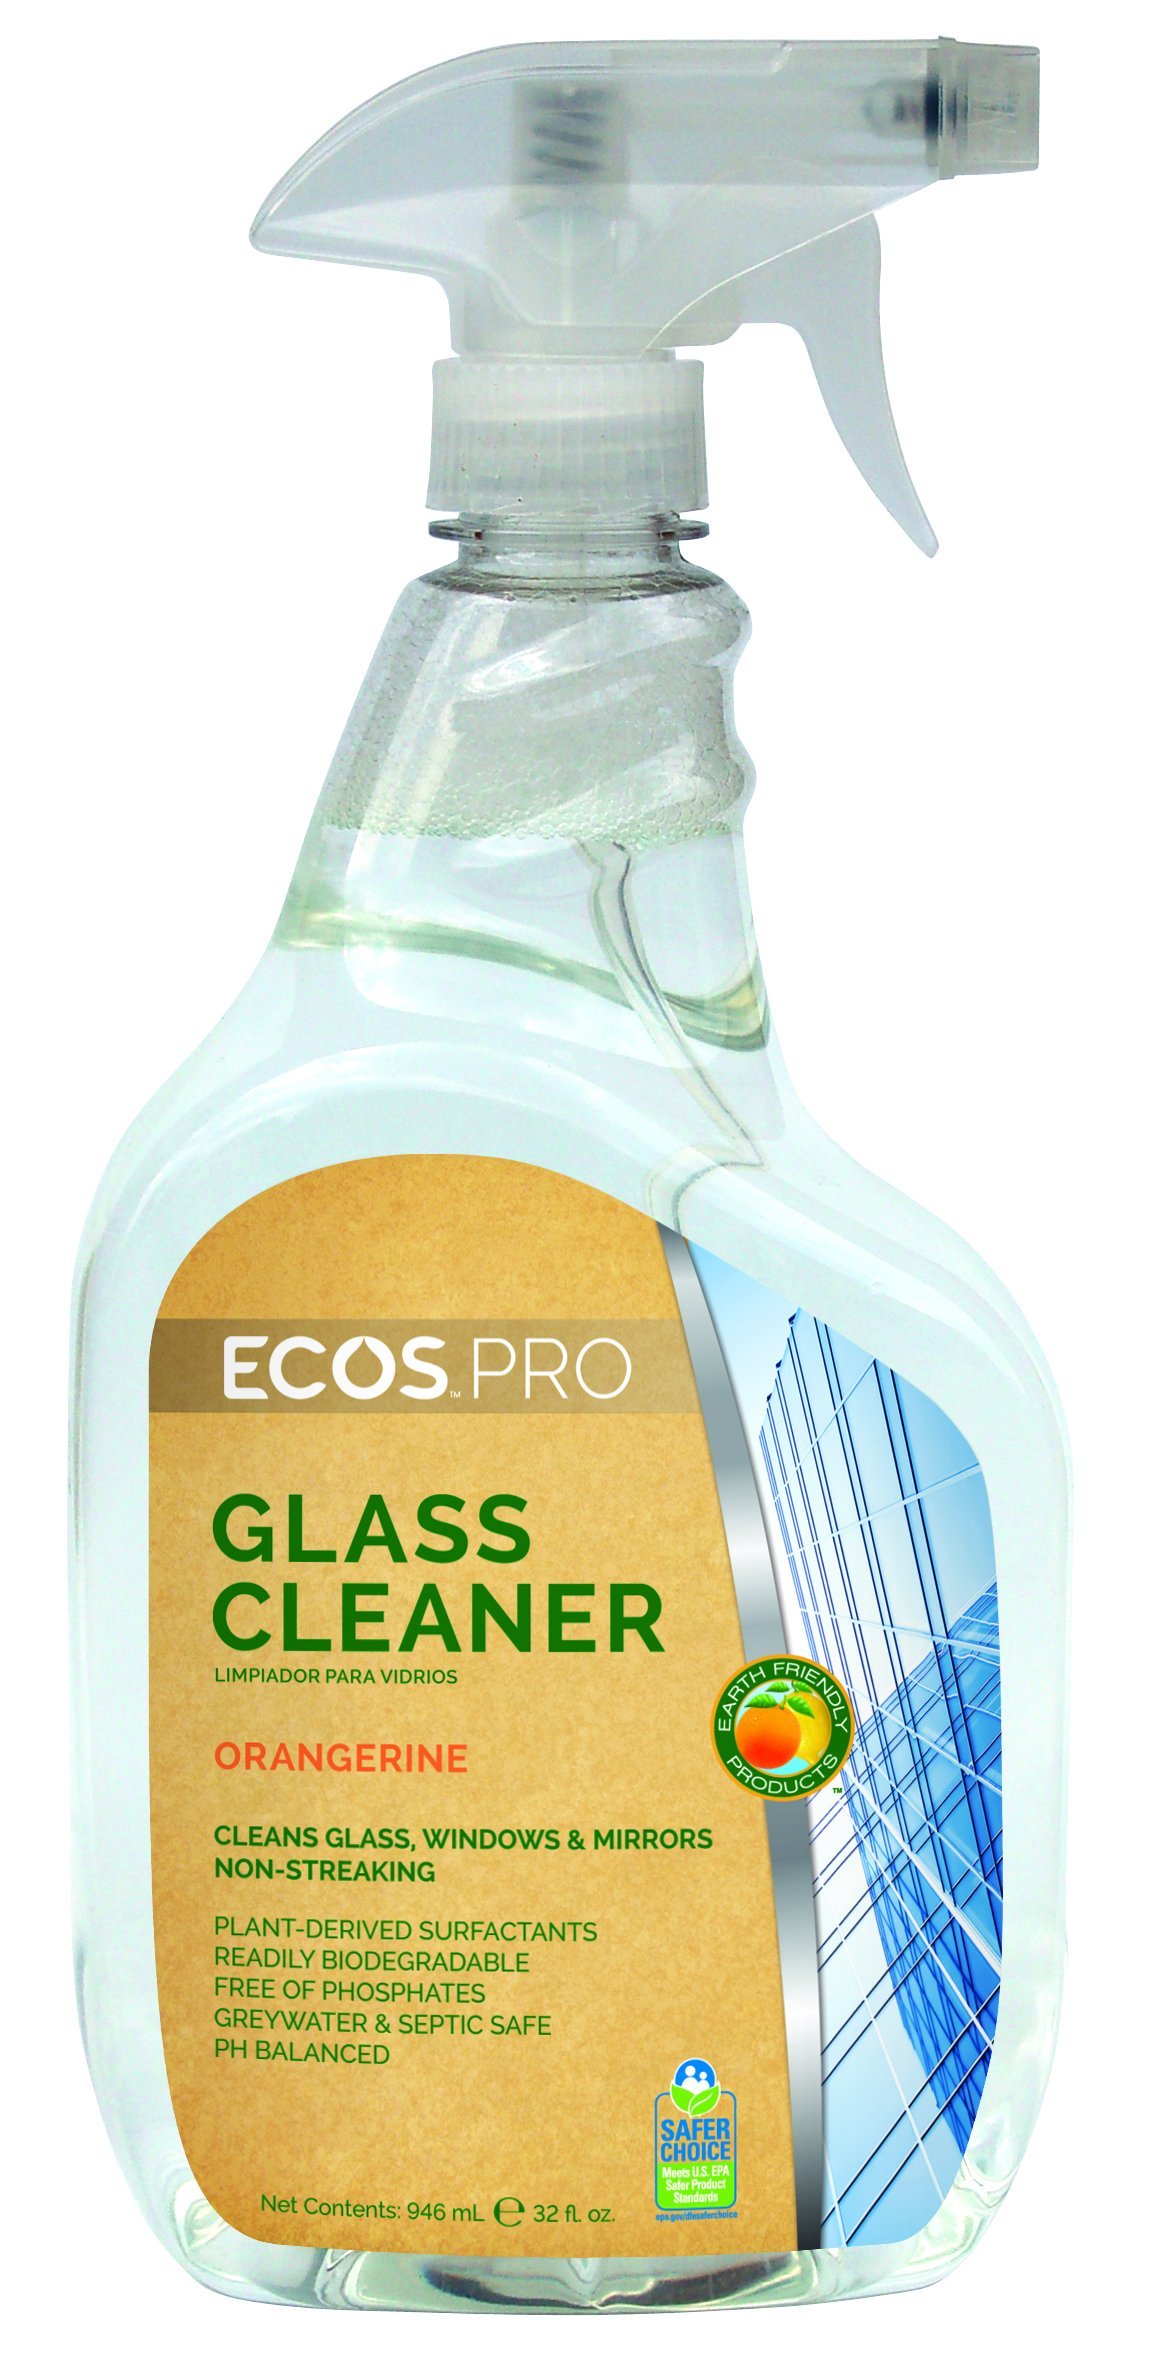 ECOS PRO PL9362/6 Glass Cleaner, Orangerine (Pack of 6)